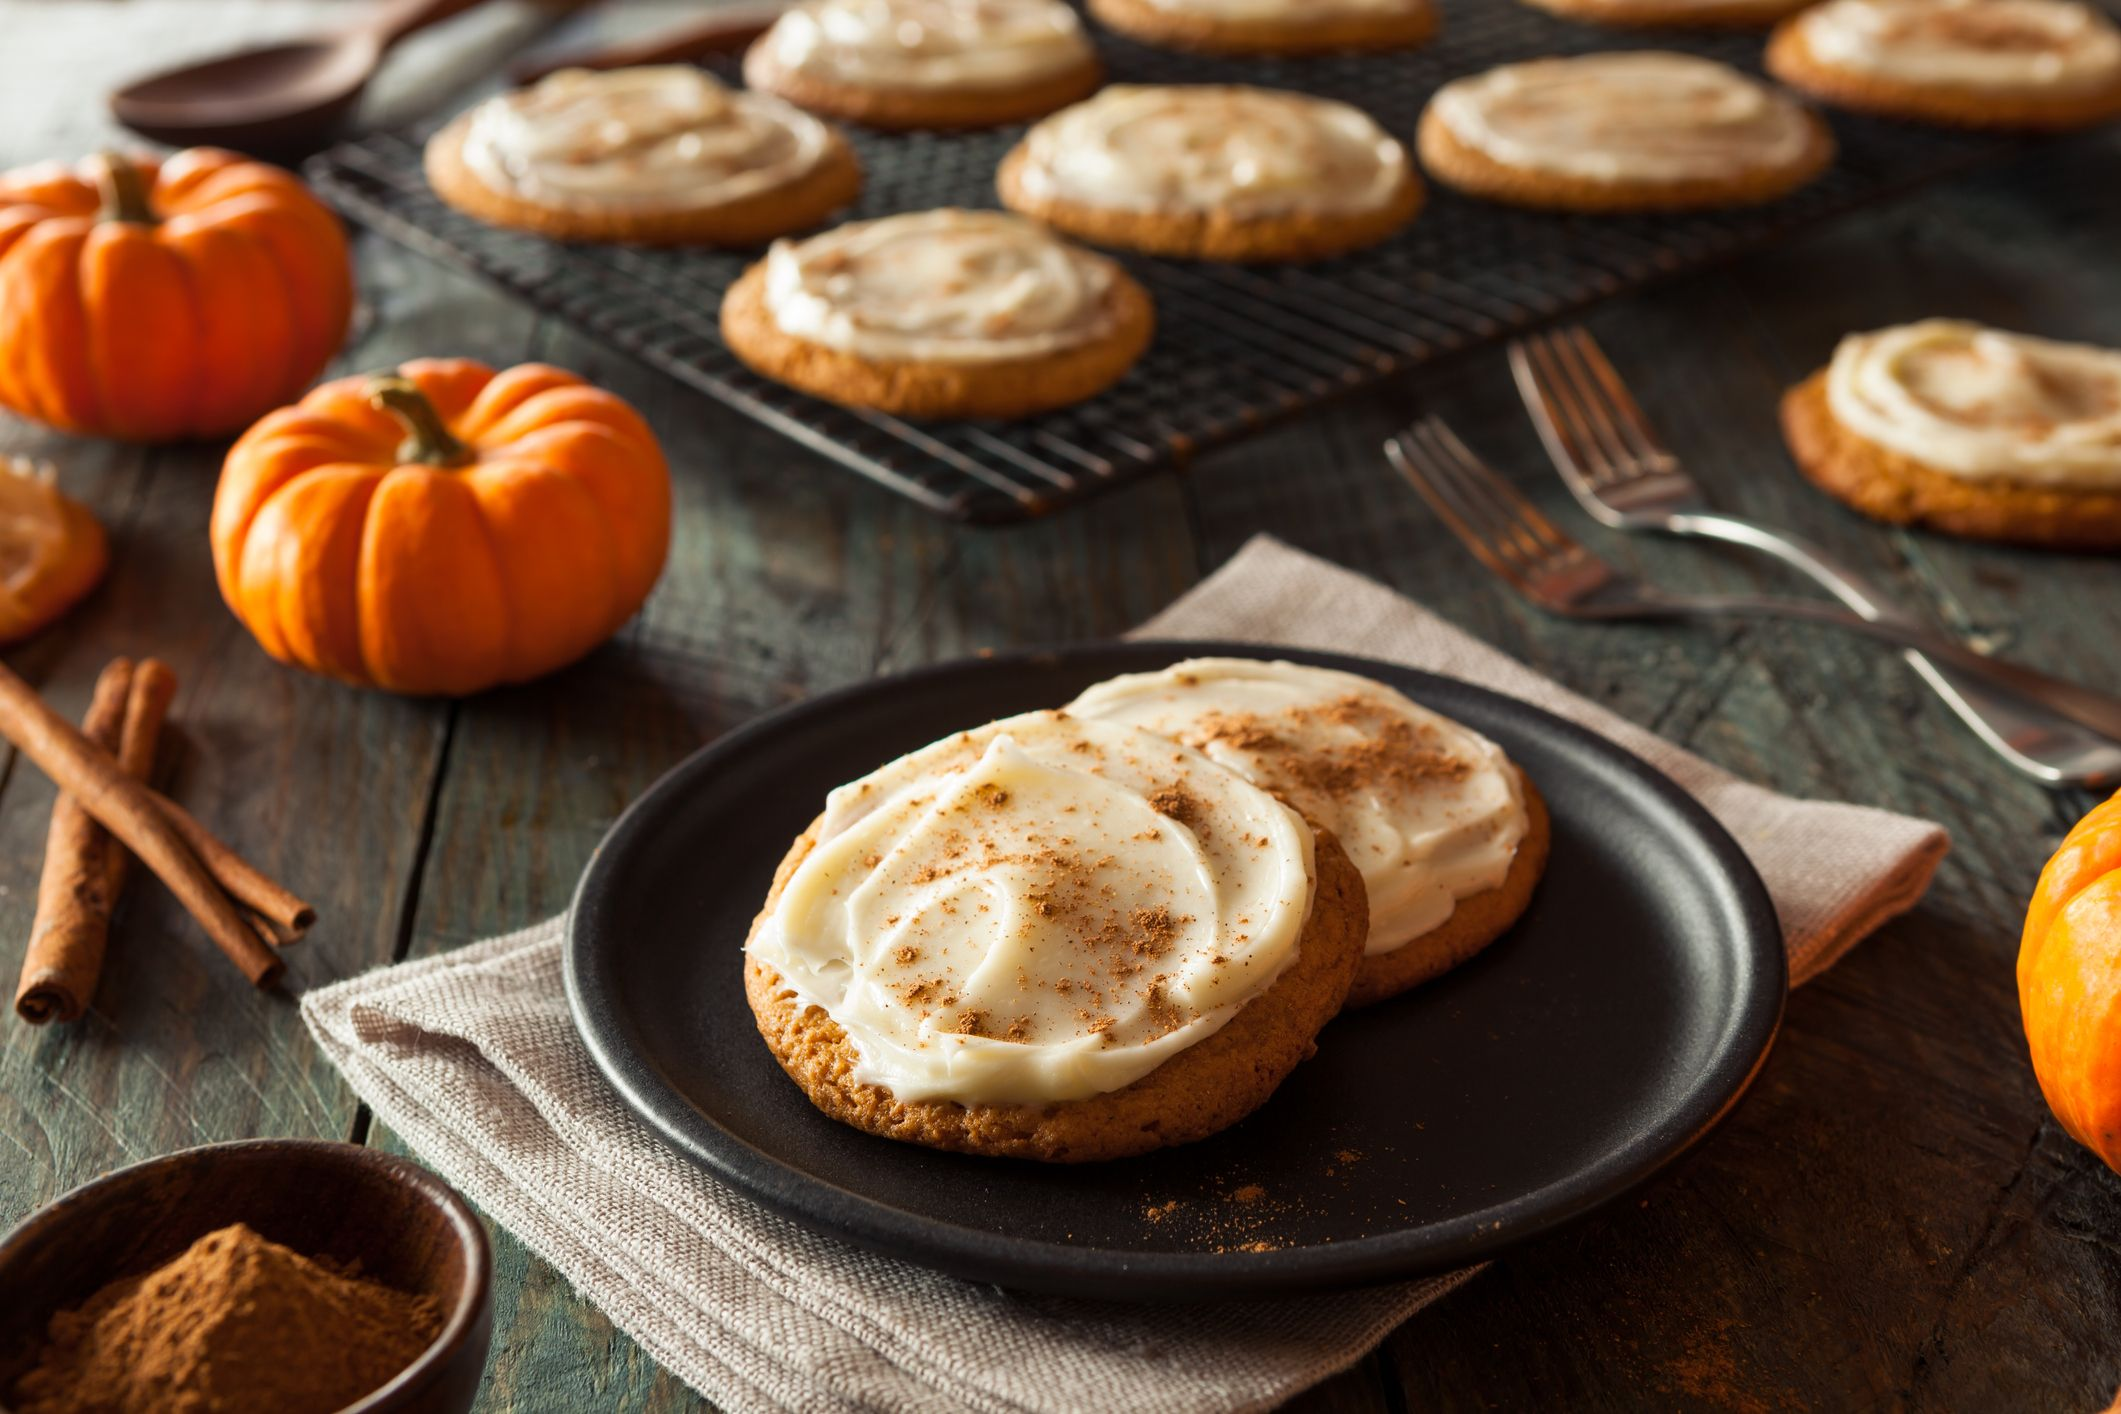 21 Easy Pumpkin Cookie Recipes - How to Make Pumpkin Cookies